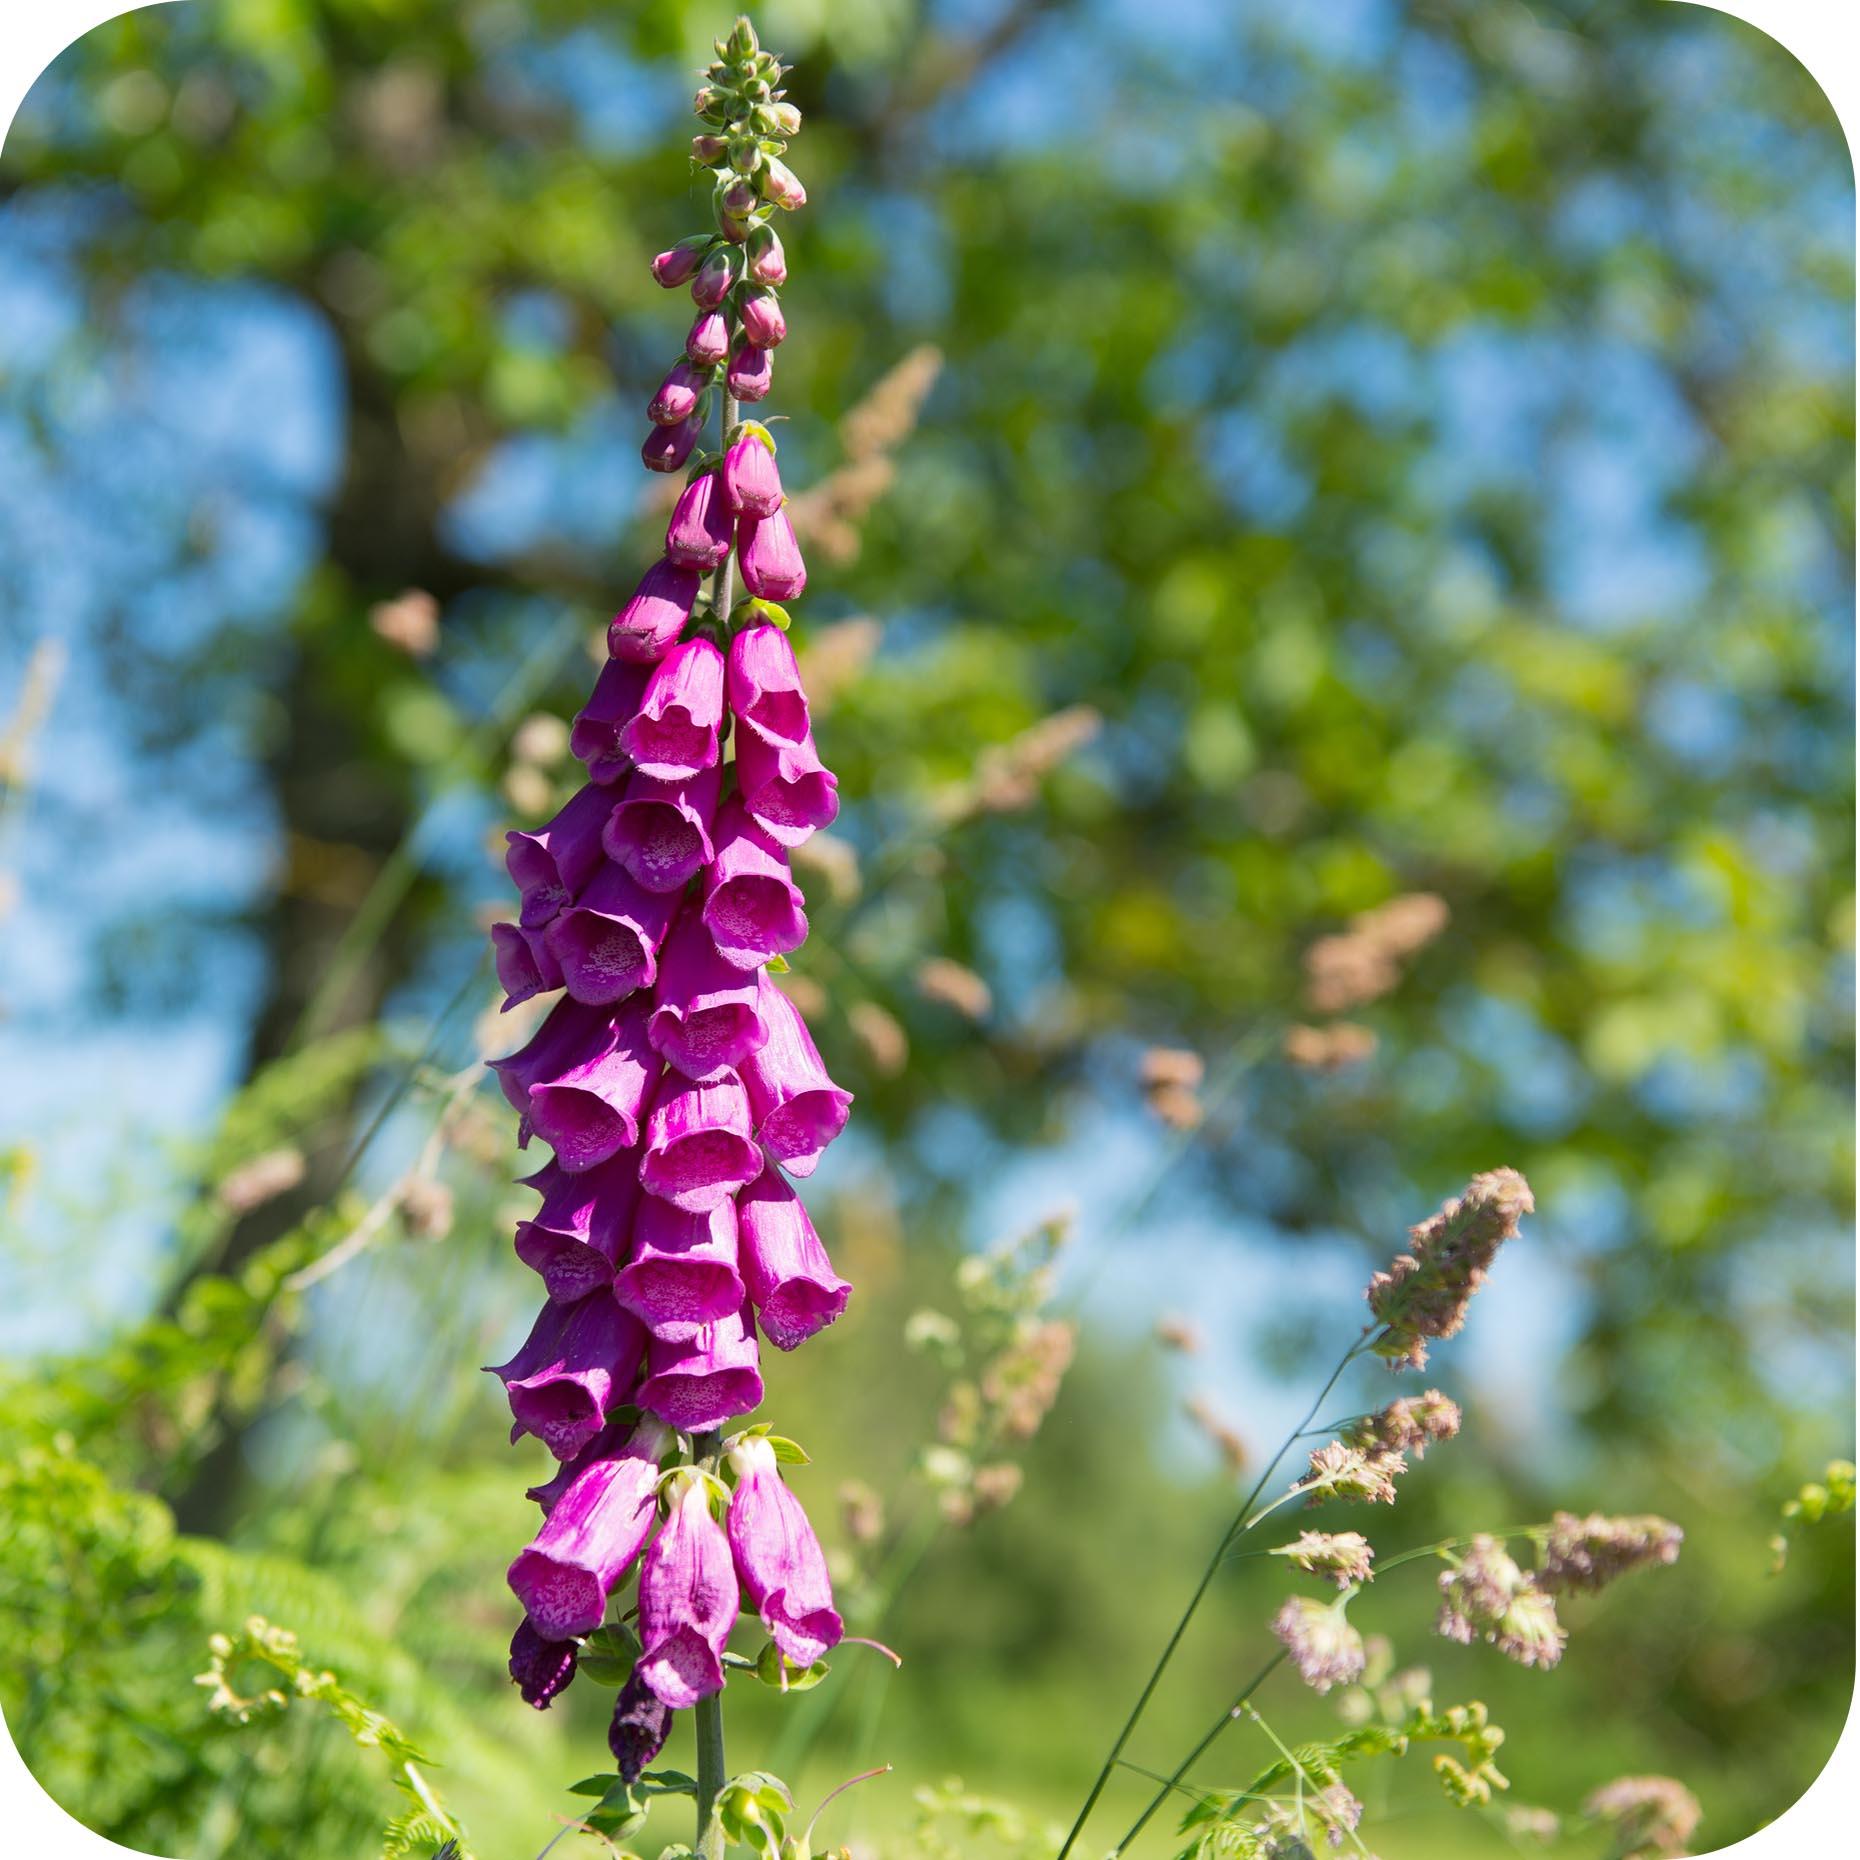 Foxglove (Digitalis purpurea) plug plants